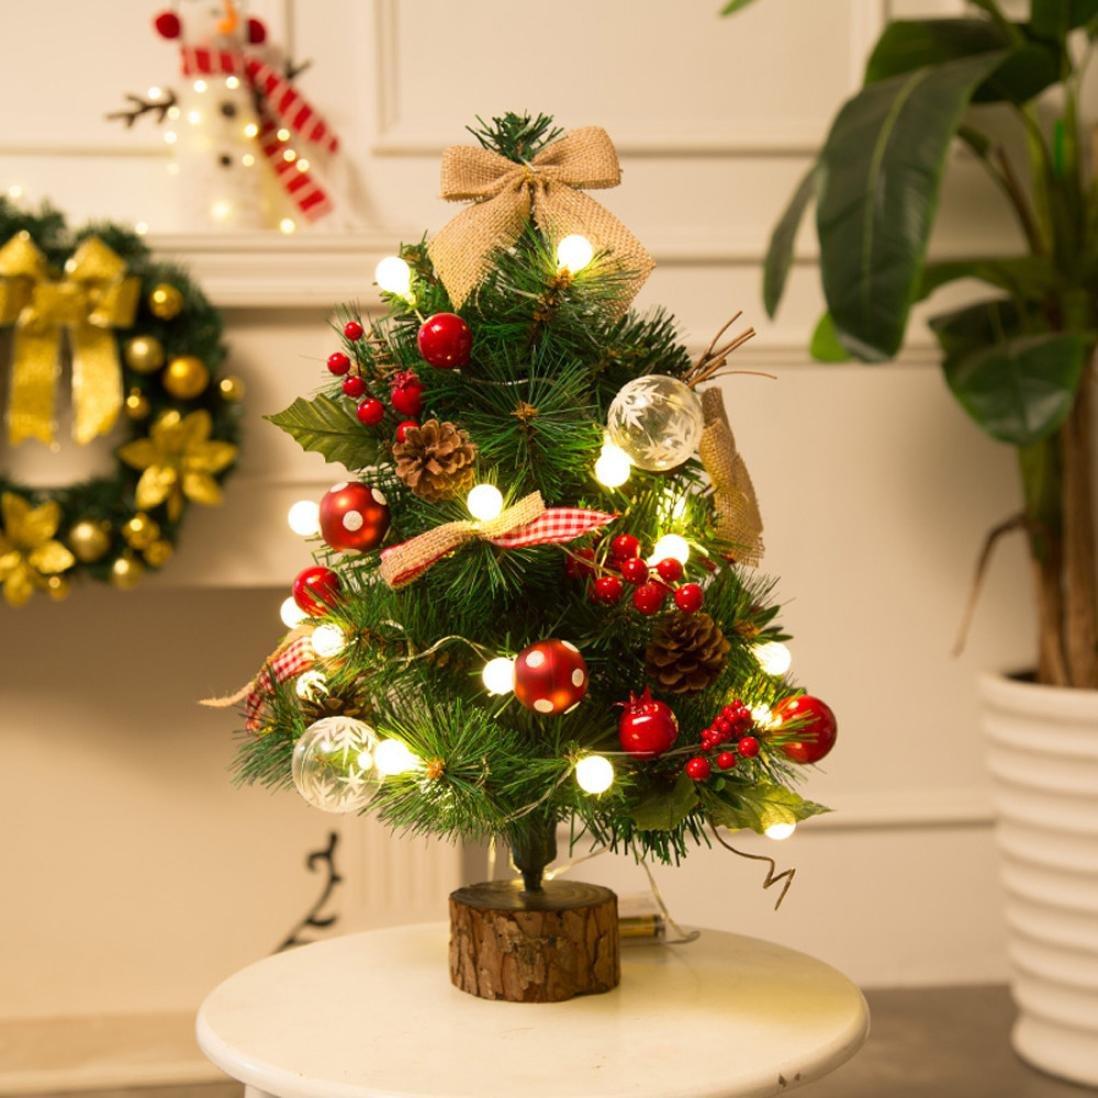 LED Christmas Tree, Staron Artificial Flocking Xmas Festival Decorative Multicolor Lights Holiday Party Desk Window Decoration Home Decor (Multicolor)